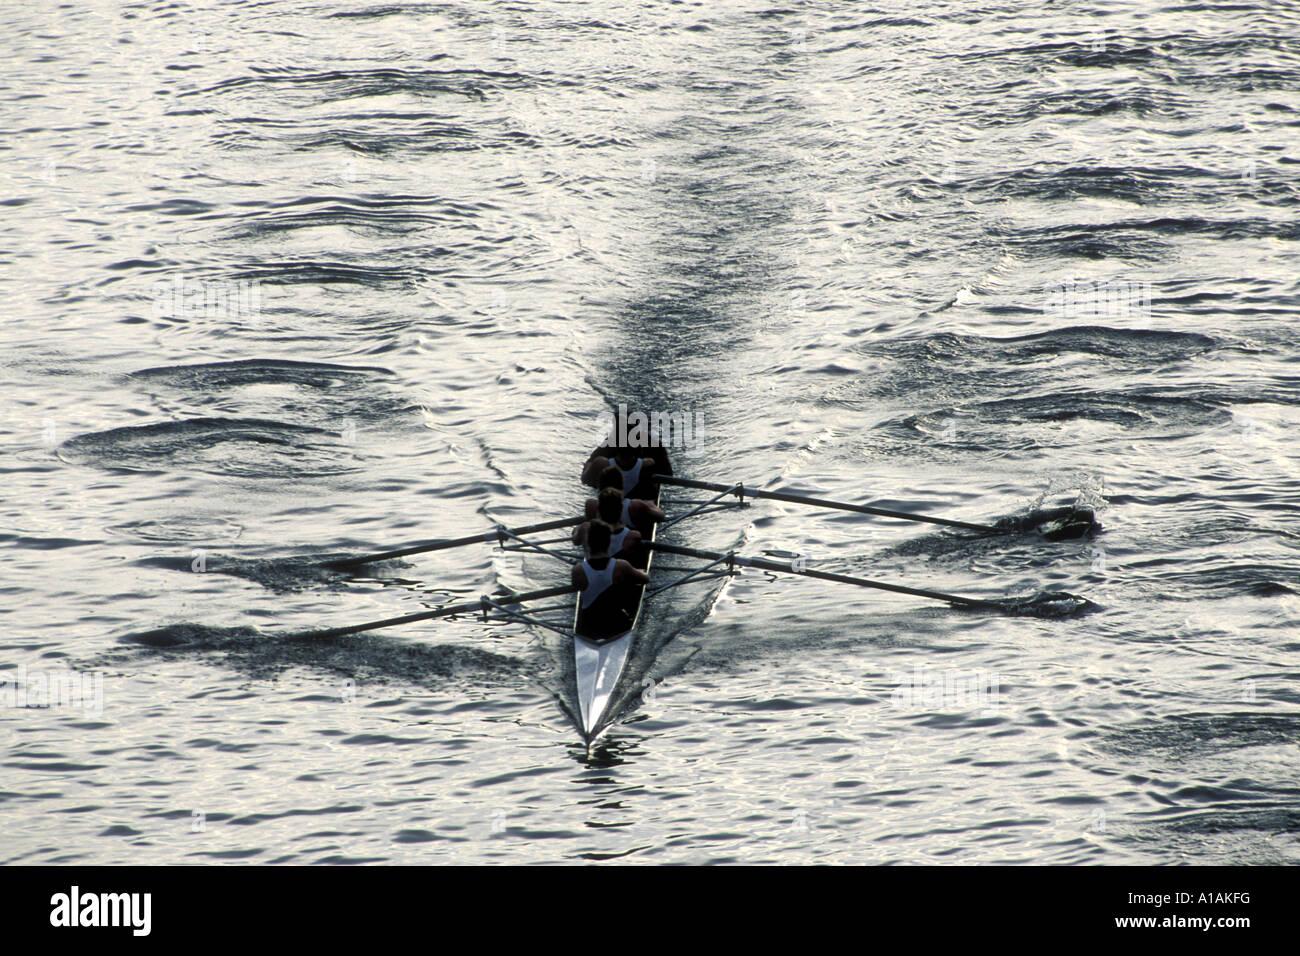 USA Washington Seattle Rowing teams scull through Montlake Cut during Husky Invitational at dawn in Lake Union - Stock Image